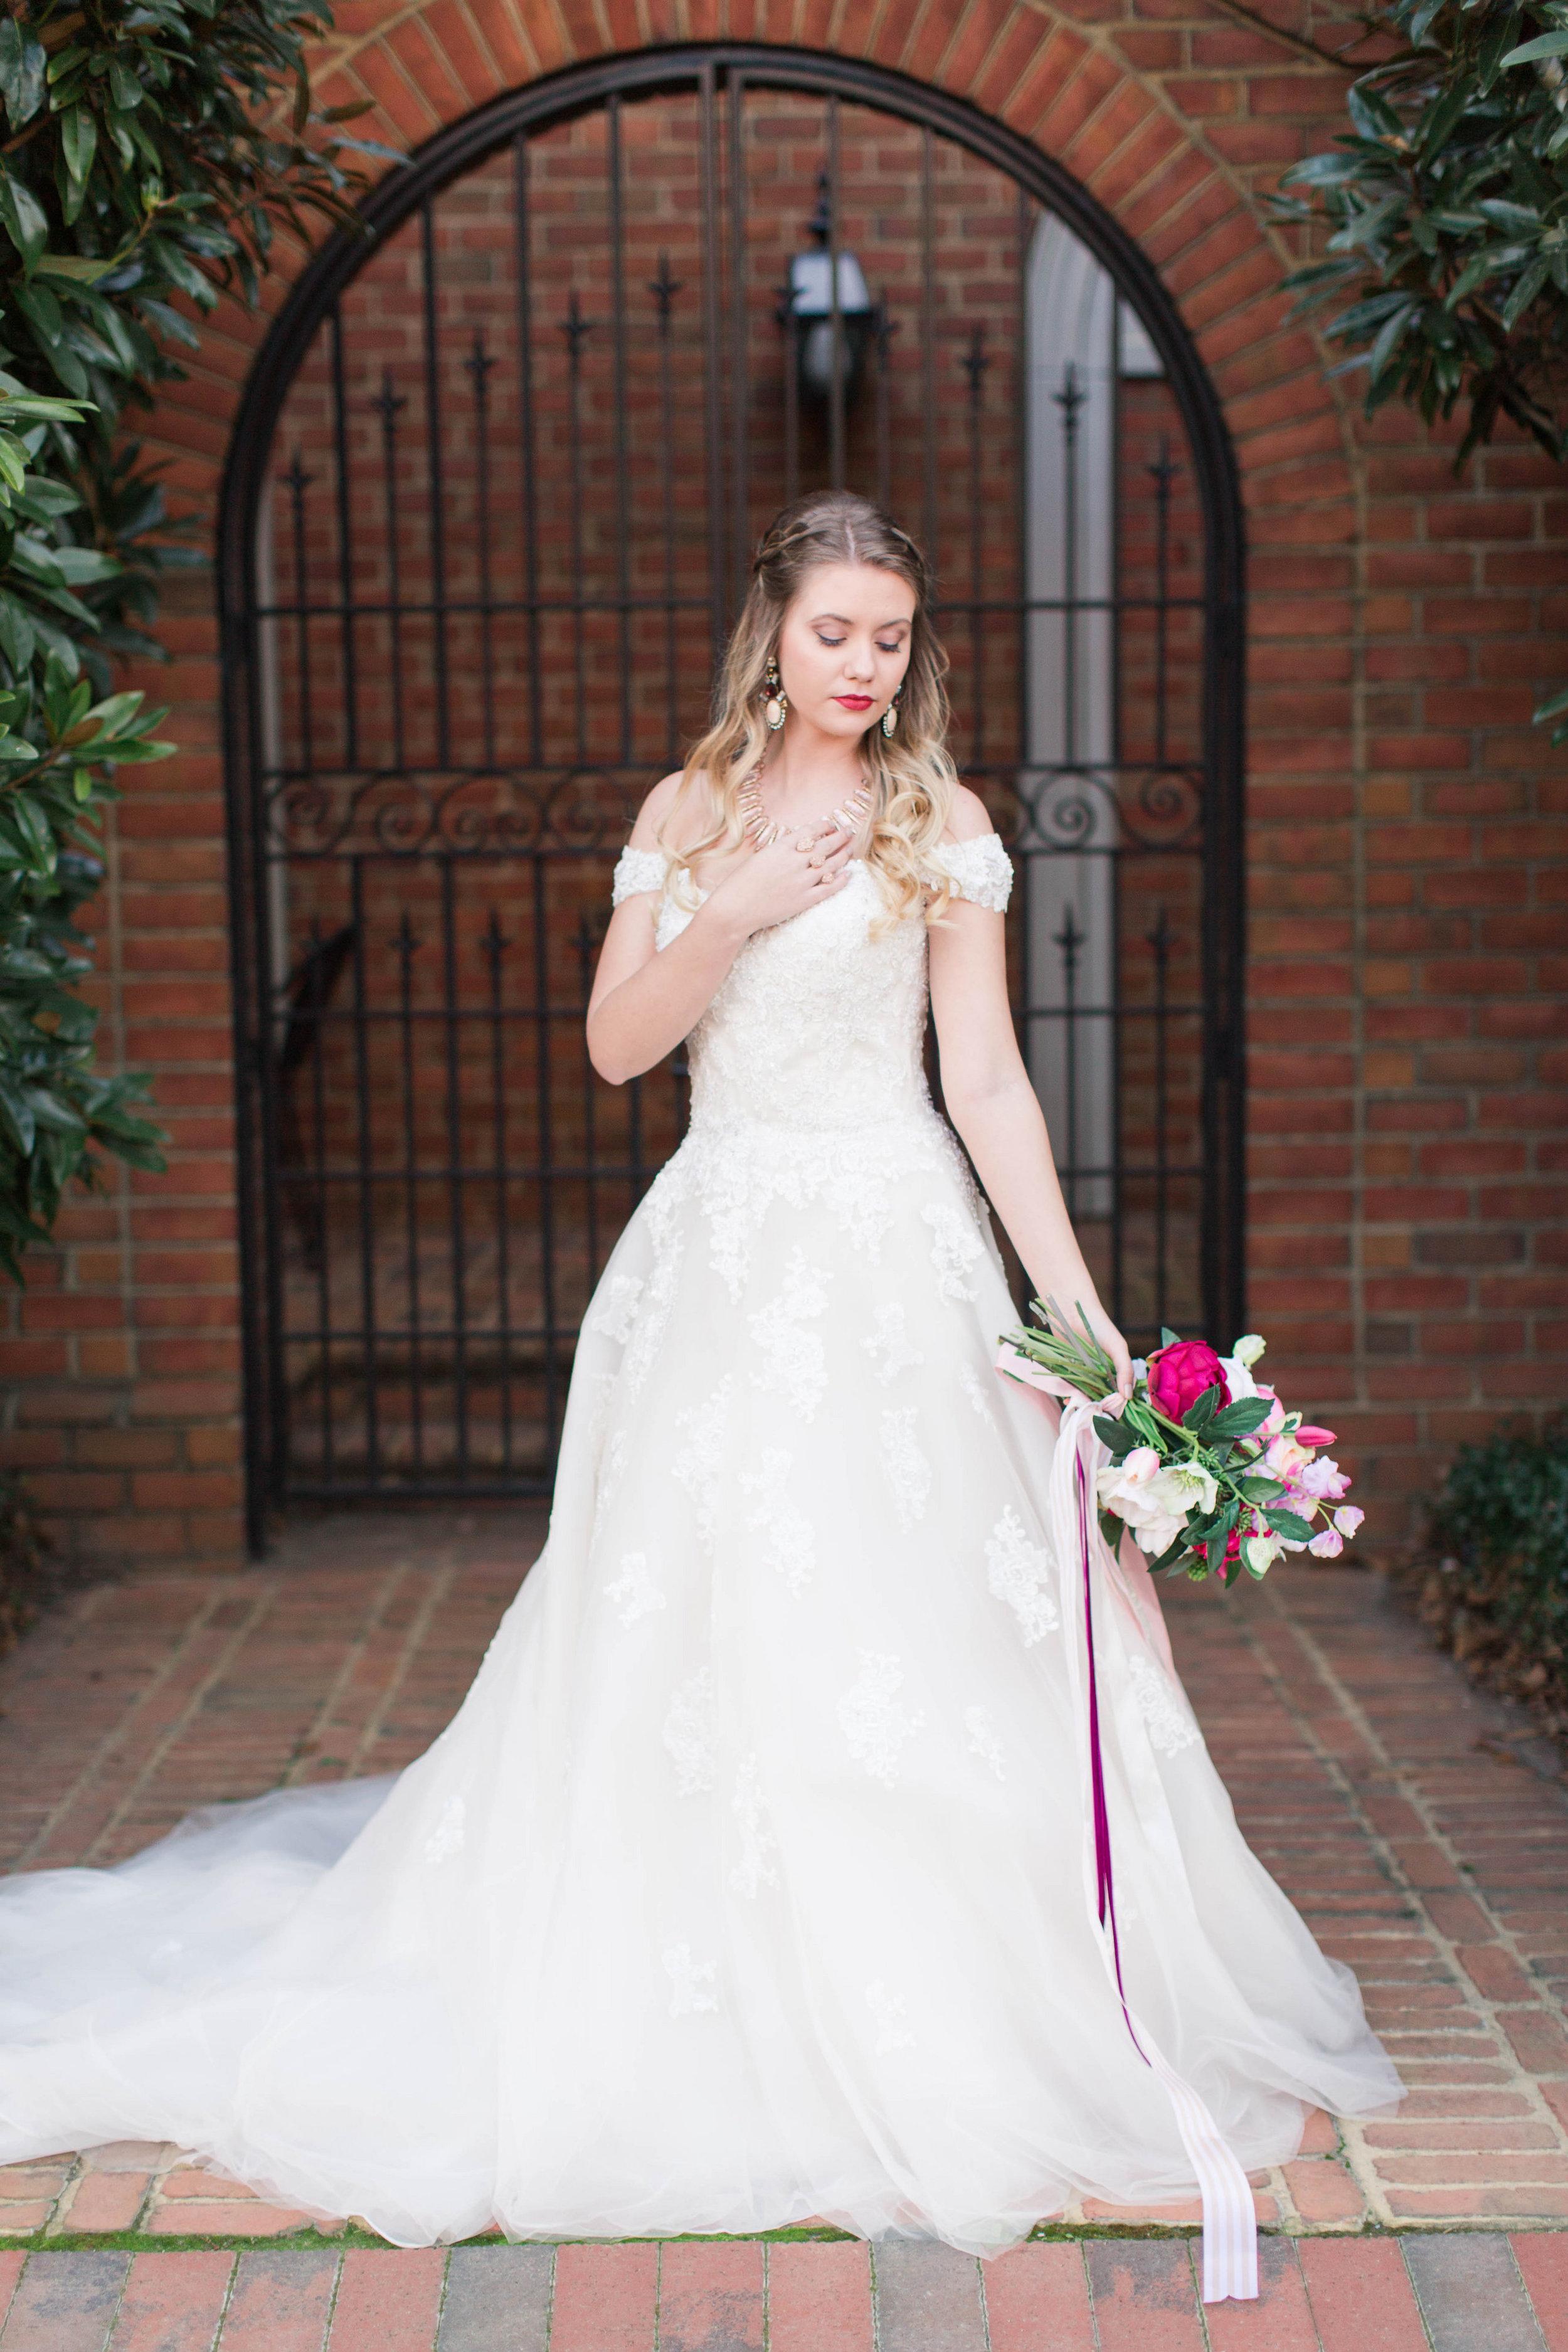 afloral-fake-flower-wedding-ivory-and-beau-bridal-boutique-maggie-sottero-saffron-the-hall-on-vine-wedding-statesboro-wedding-savannah-wedding-kristian-designs-rachel-strickland-photography-savannah-bridal-southern-bride-savannah-bride-4.jpg